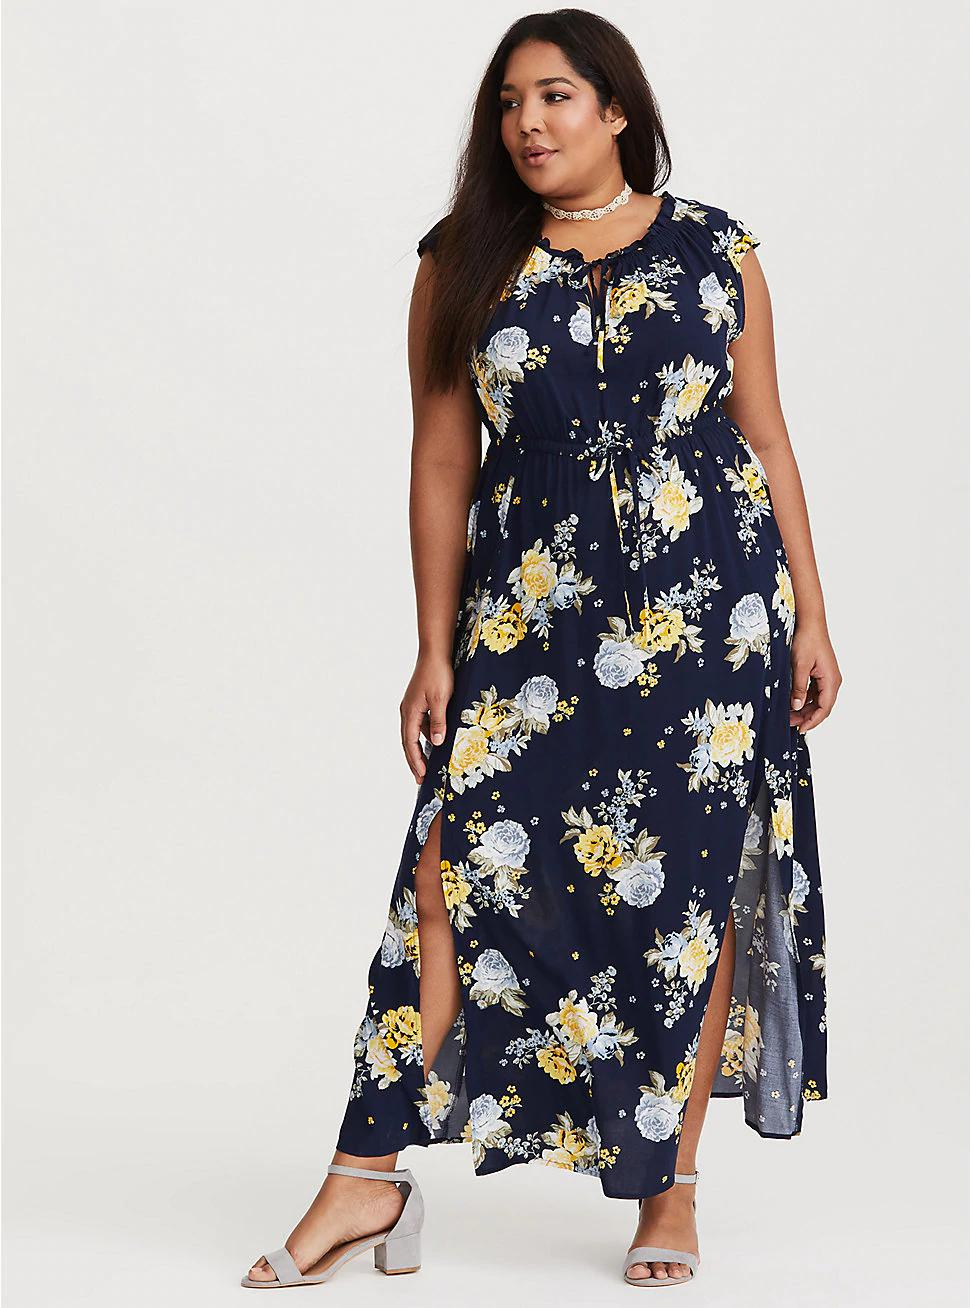 852f42c82b0 Navy Floral Tie Front Challis Maxi Dress